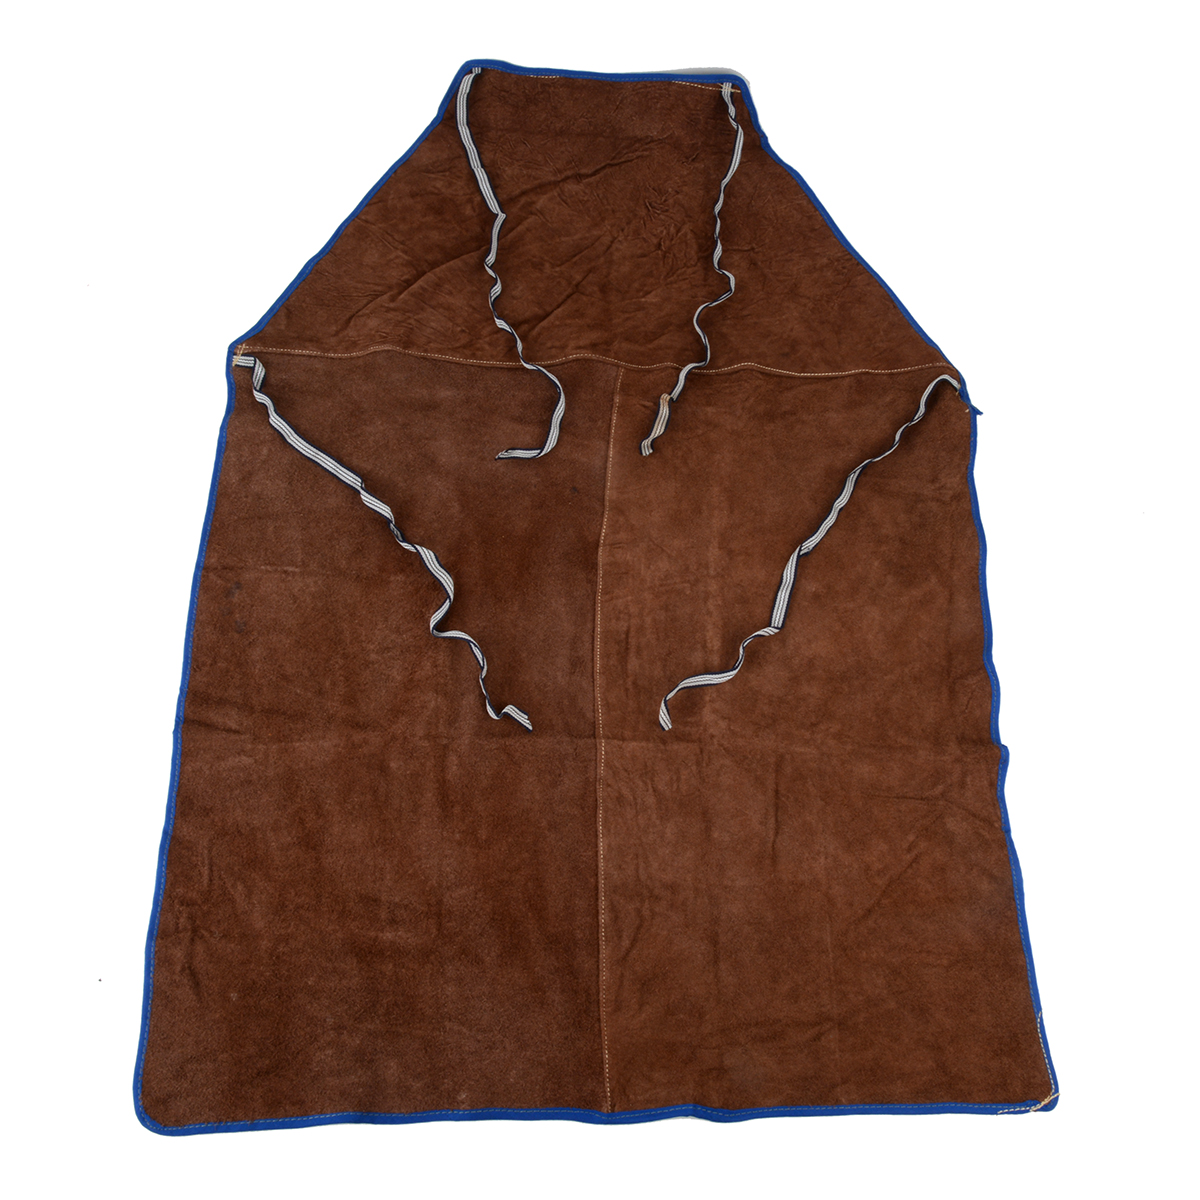 60cm*90cm Welding Apron Welder Heat Insulation Protection Cow Leather Apron Safety Workwear Welding Equipment